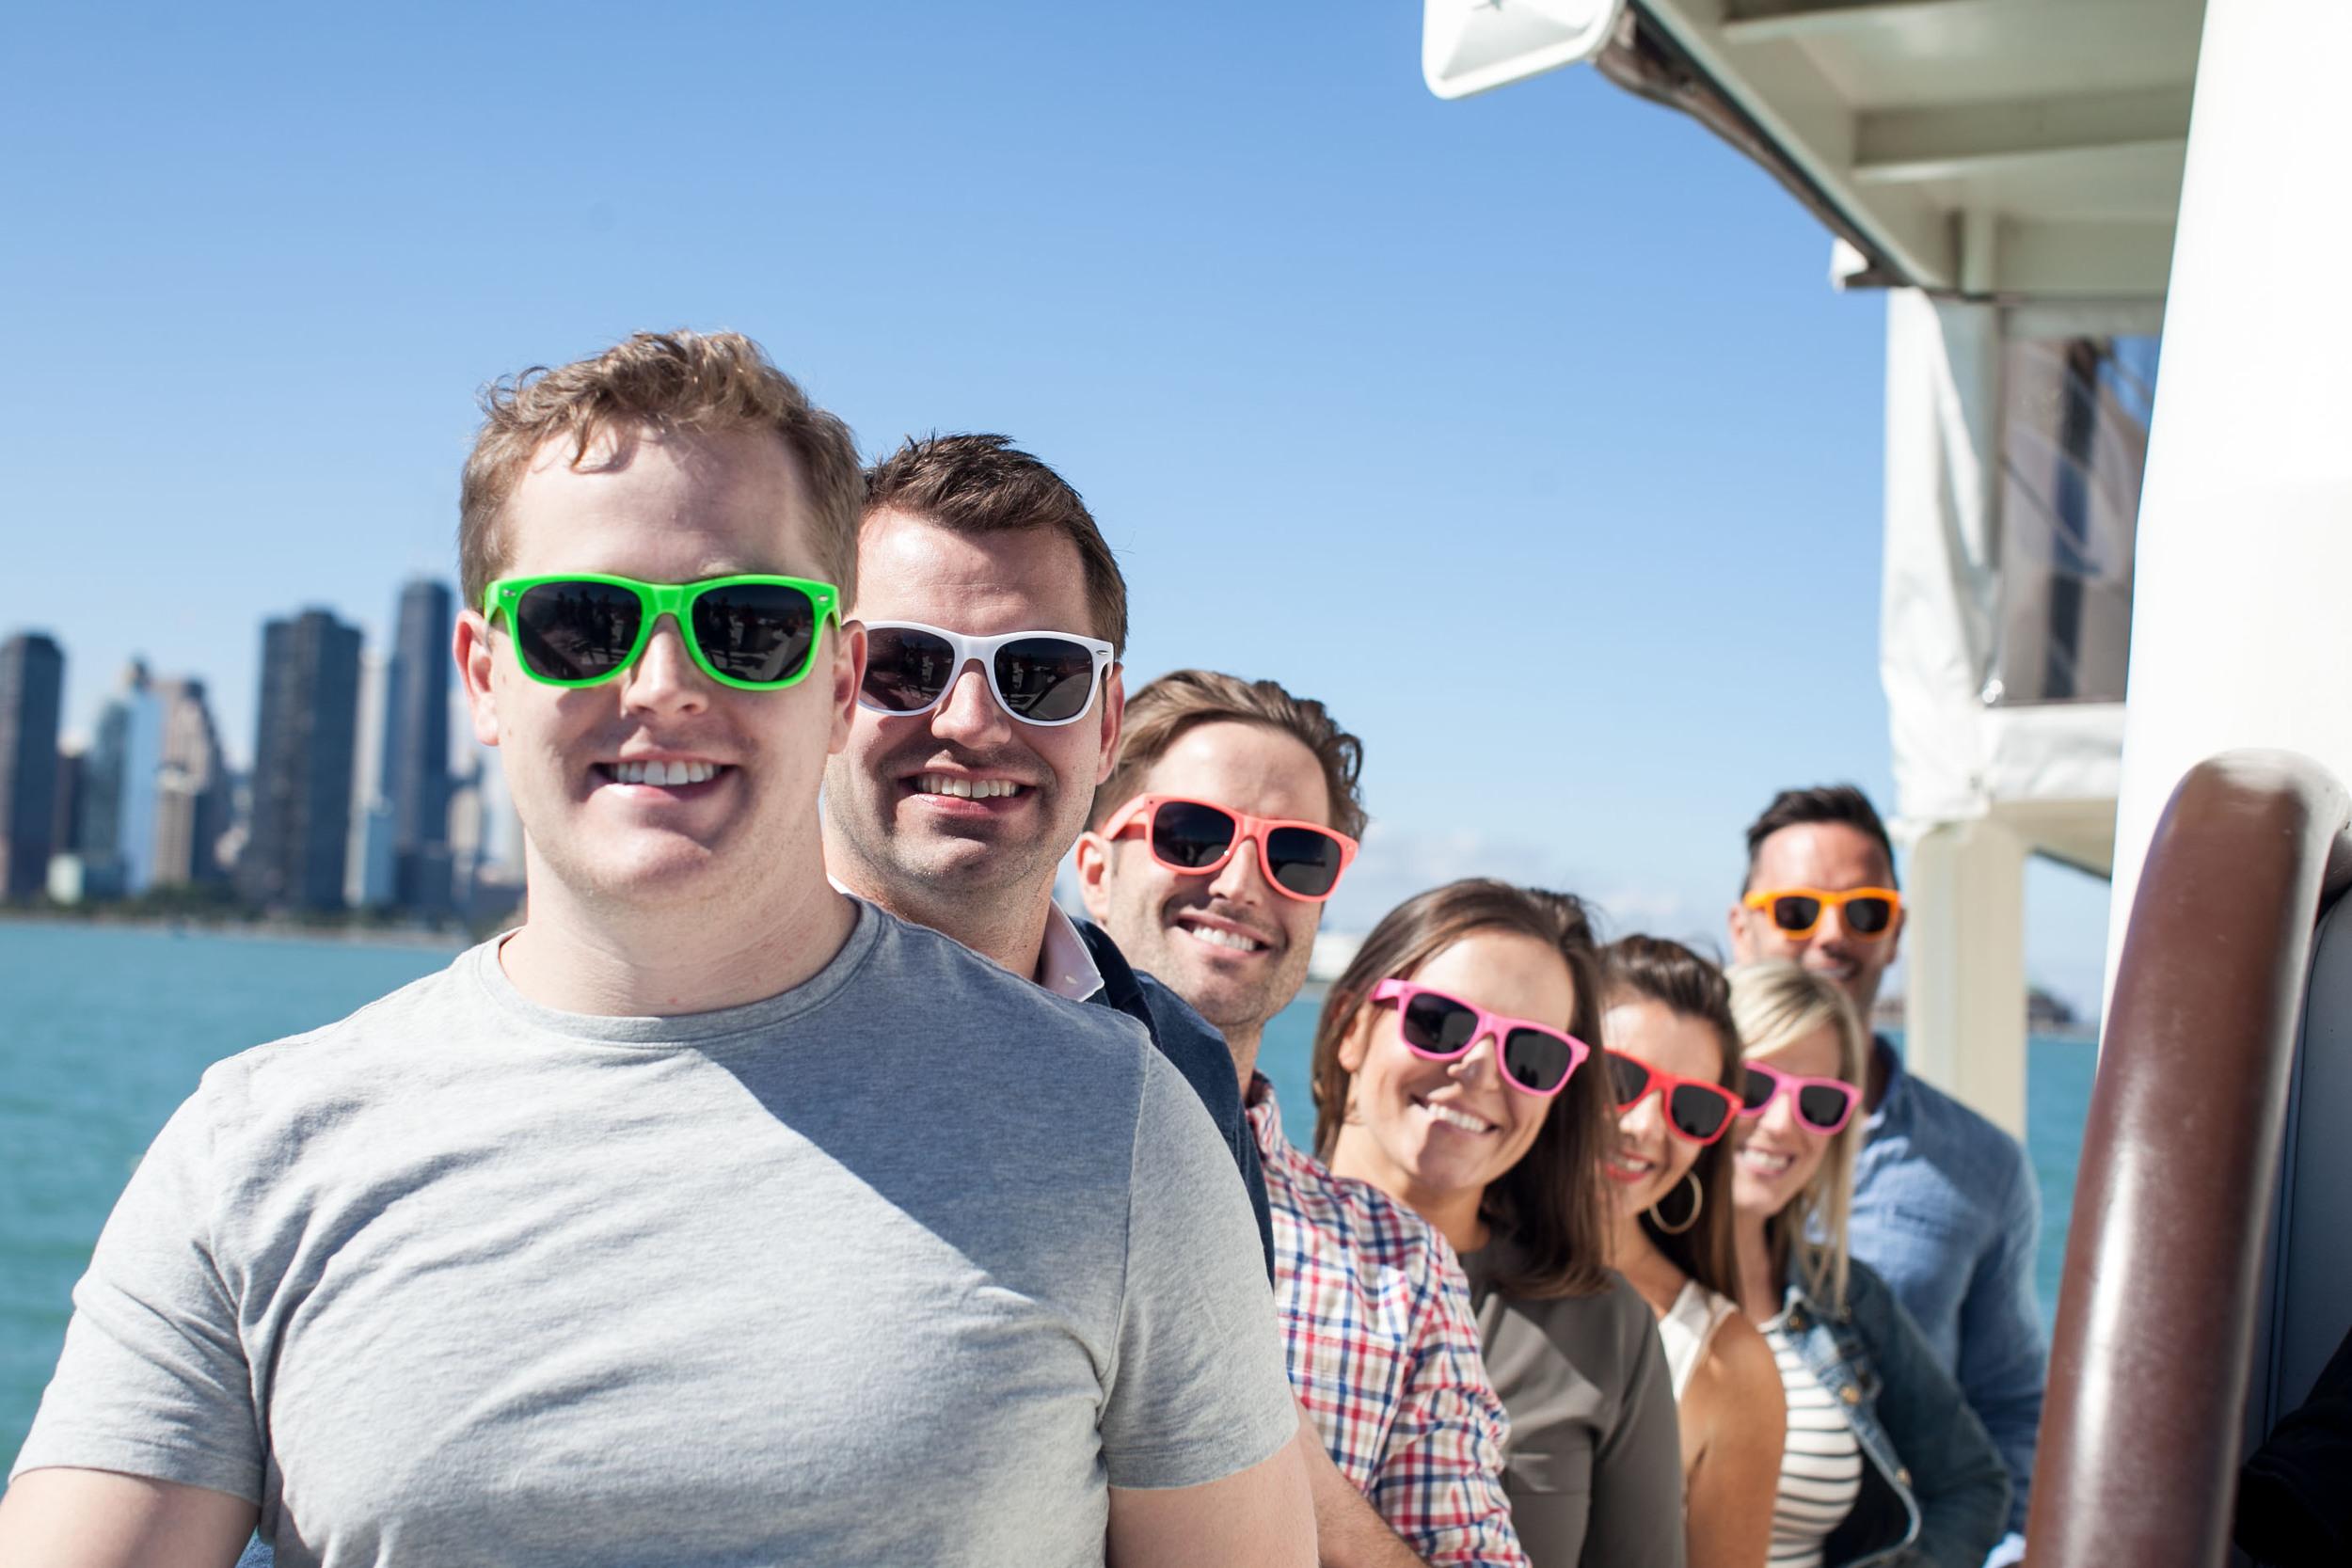 tyler's 30th chinanigans birthday celebration trolley tour of the loop burnham harbor yacht tour-36.jpg